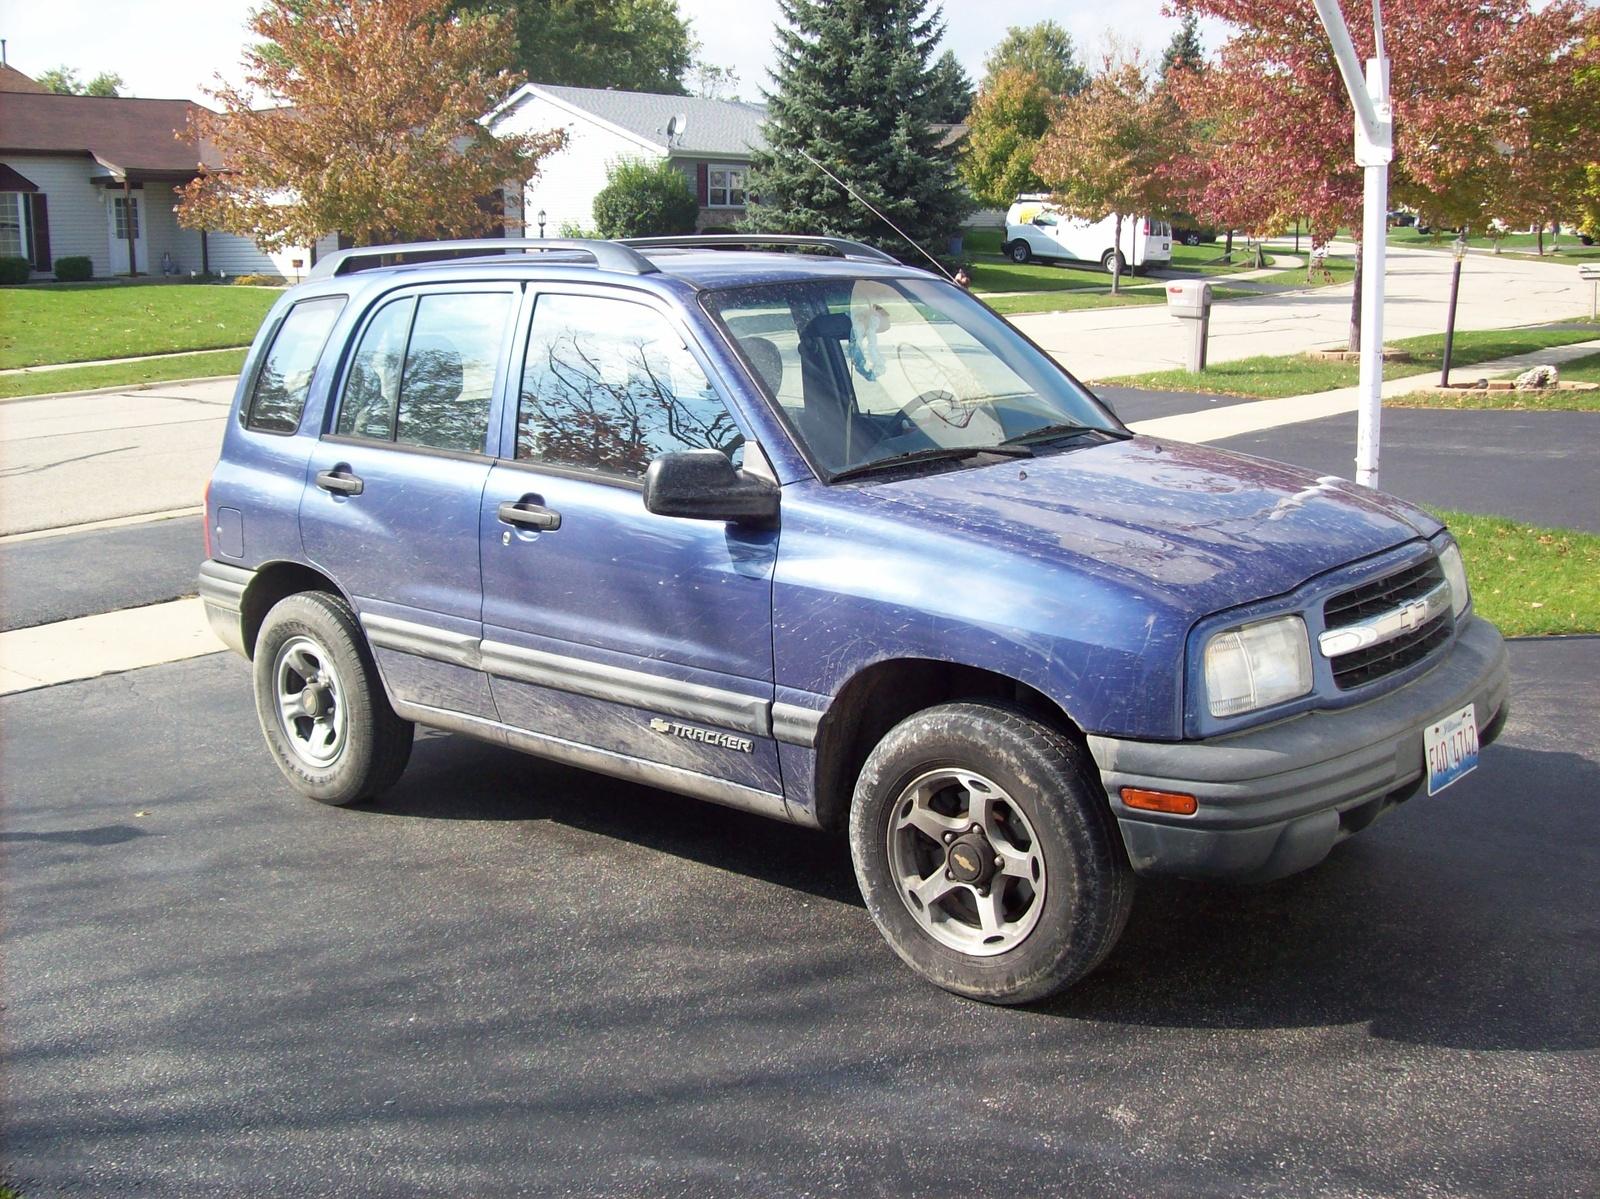 All Chevy 2002 chevrolet tracker parts : 1999 Chevrolet Tracker - Partsopen